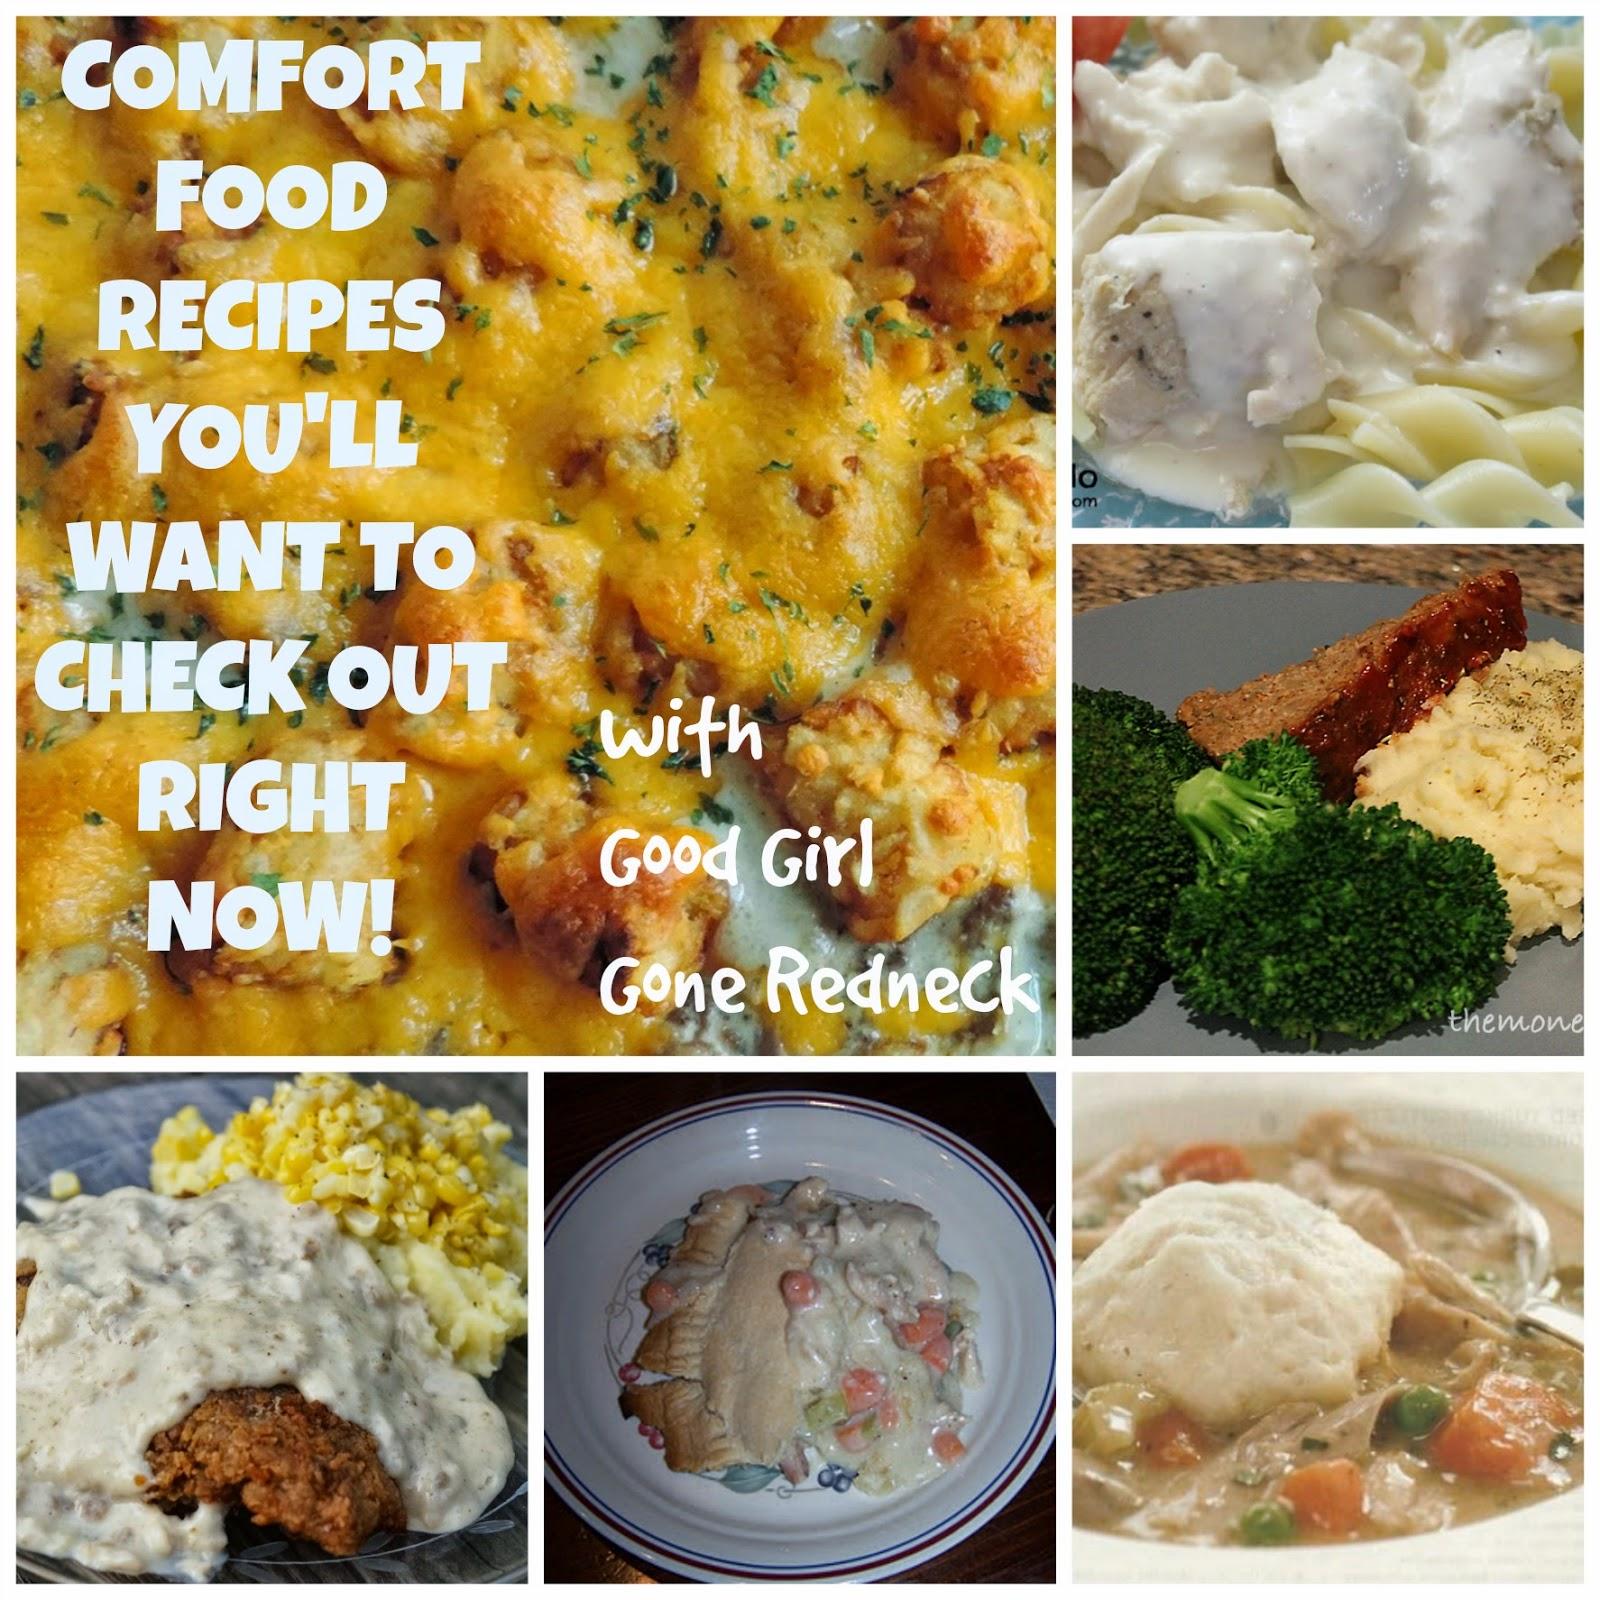 Good Girl Gone Redneck Recipes